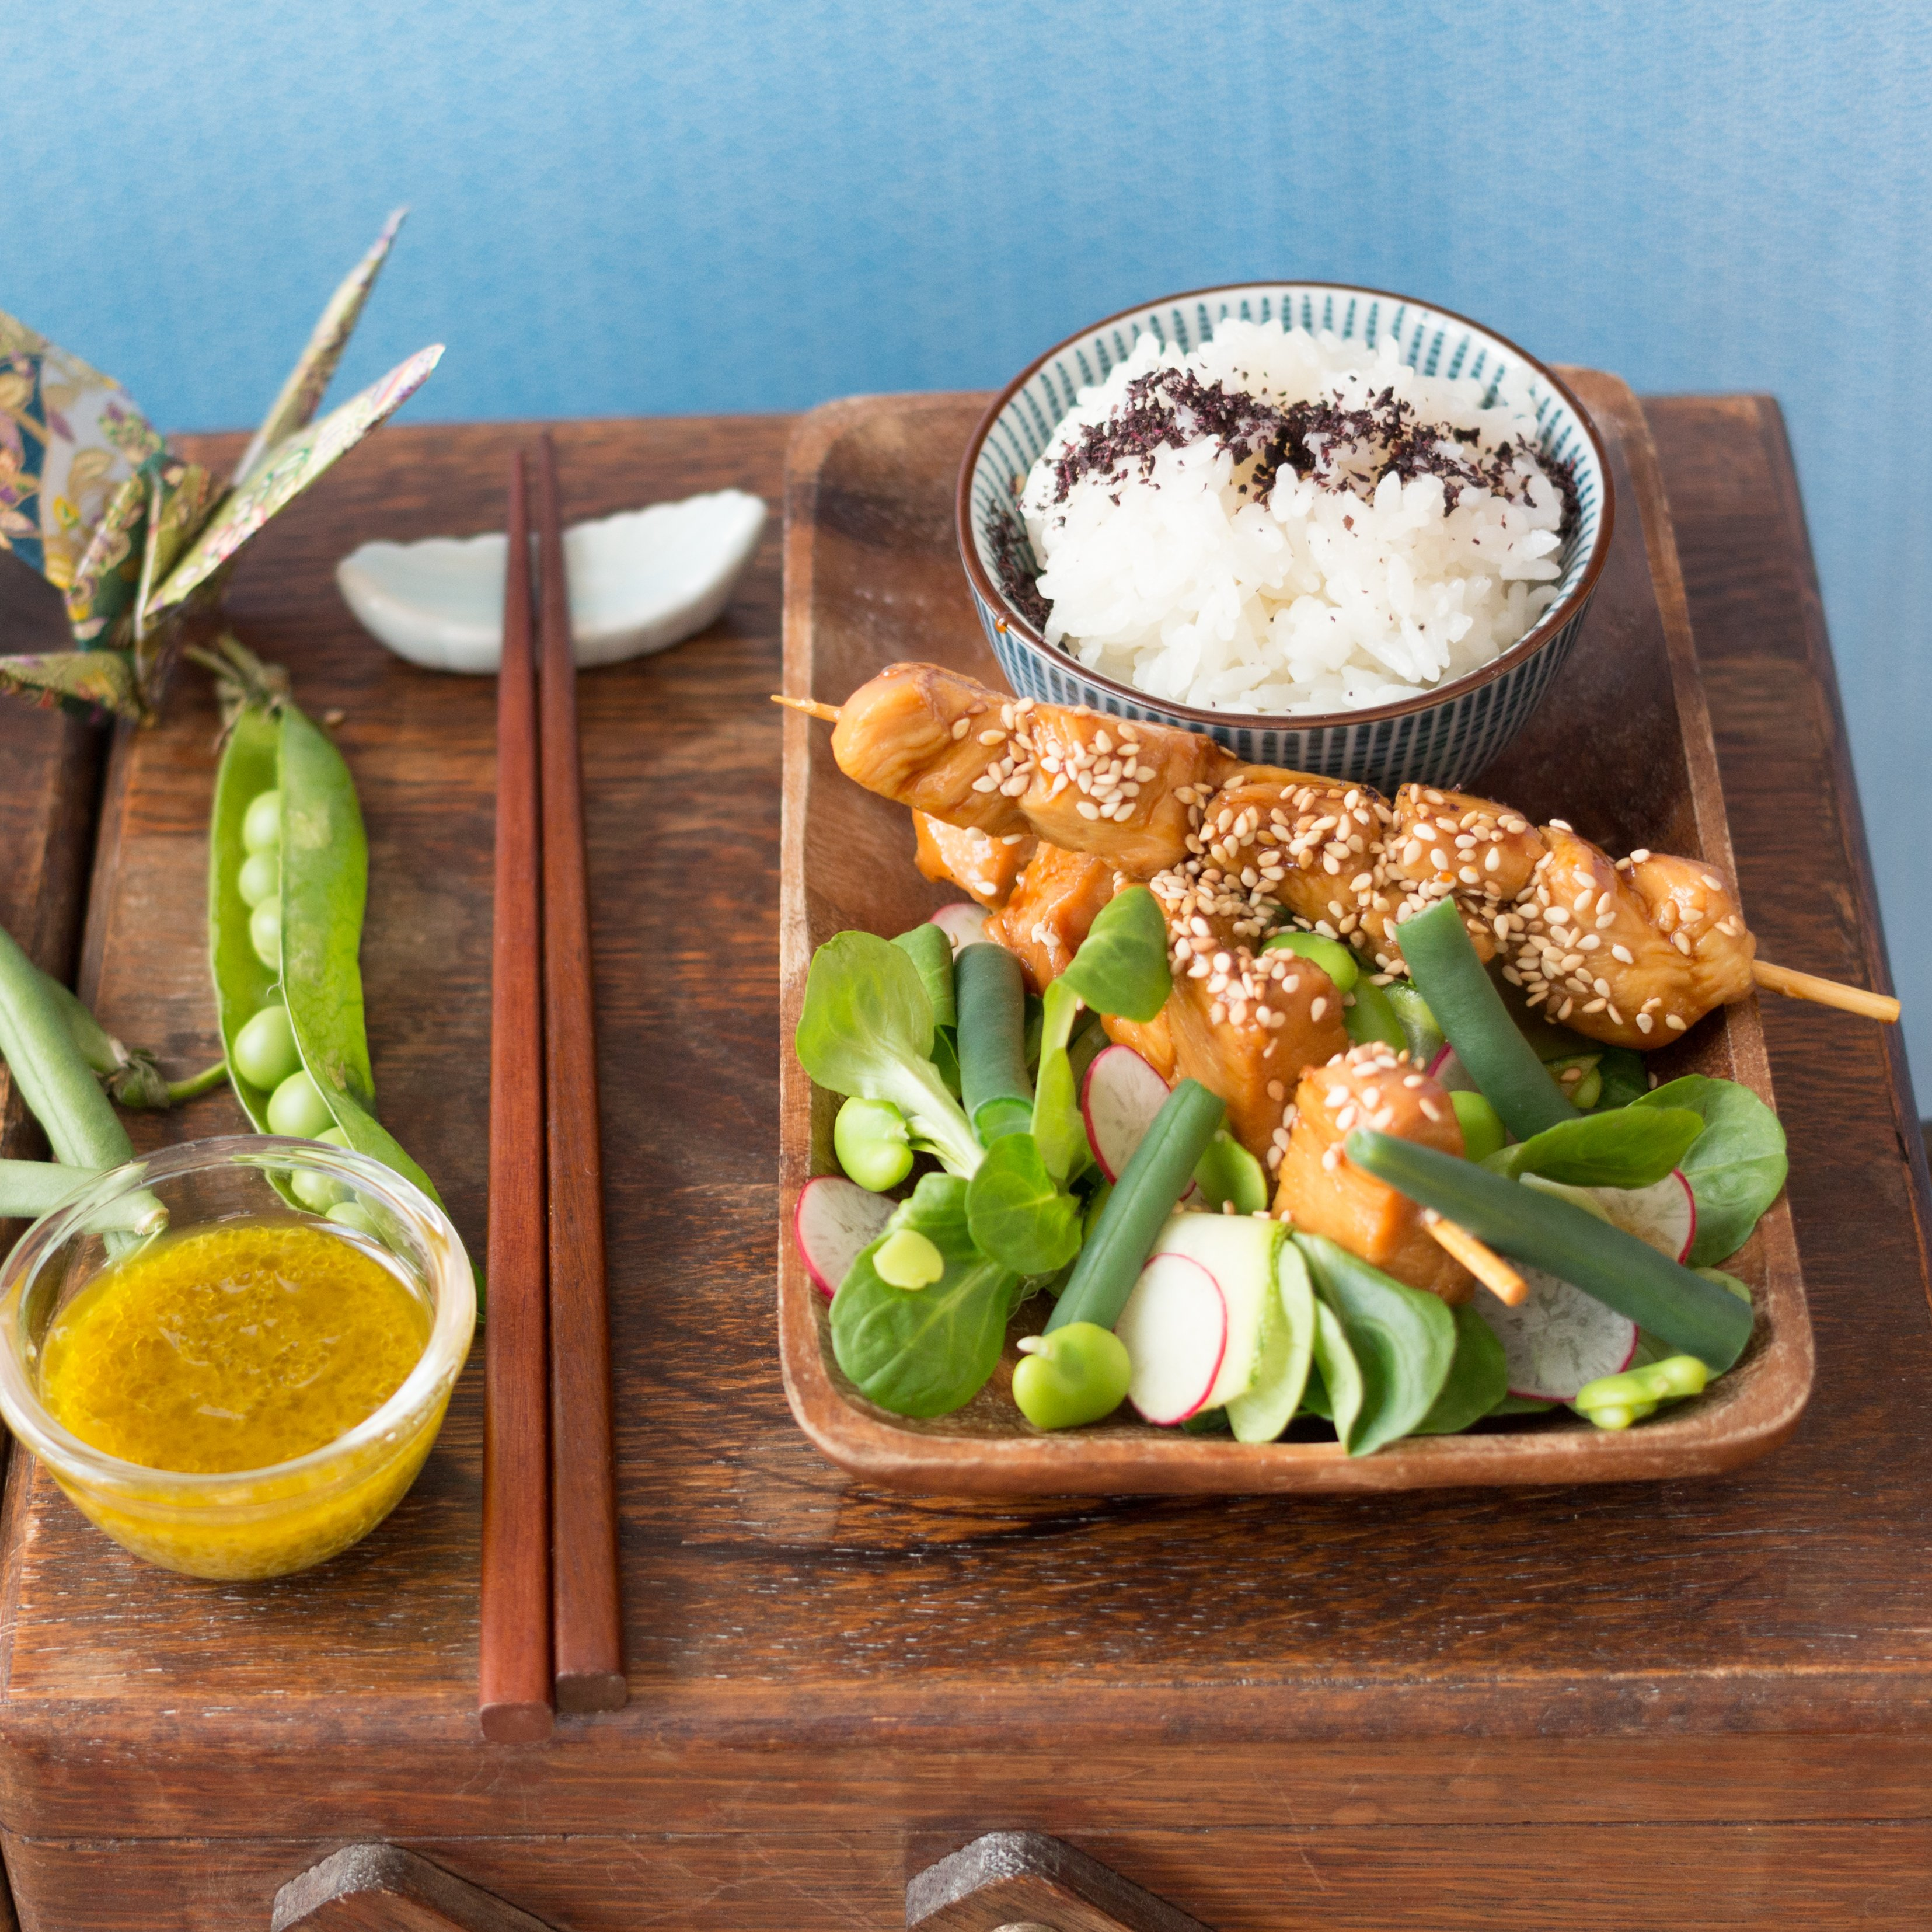 Teriyaki chicken skewers and salad with a yuzu kosho vinaigrette